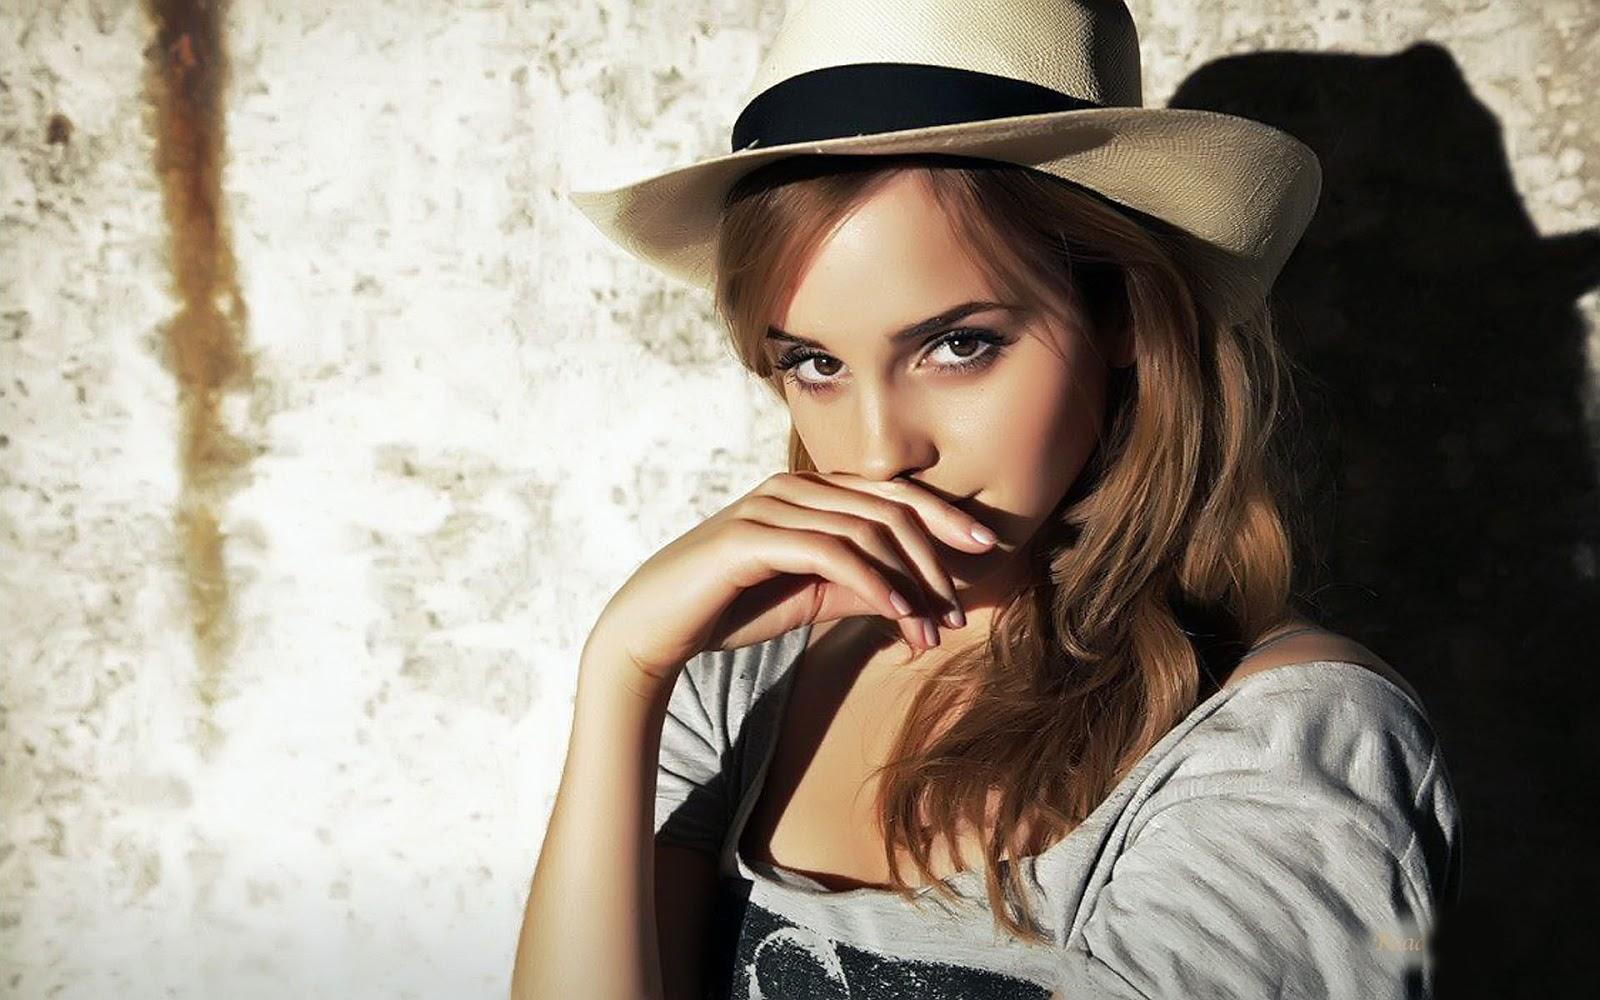 emma watson hollywood beautiful actress latest hot hd wallpapers